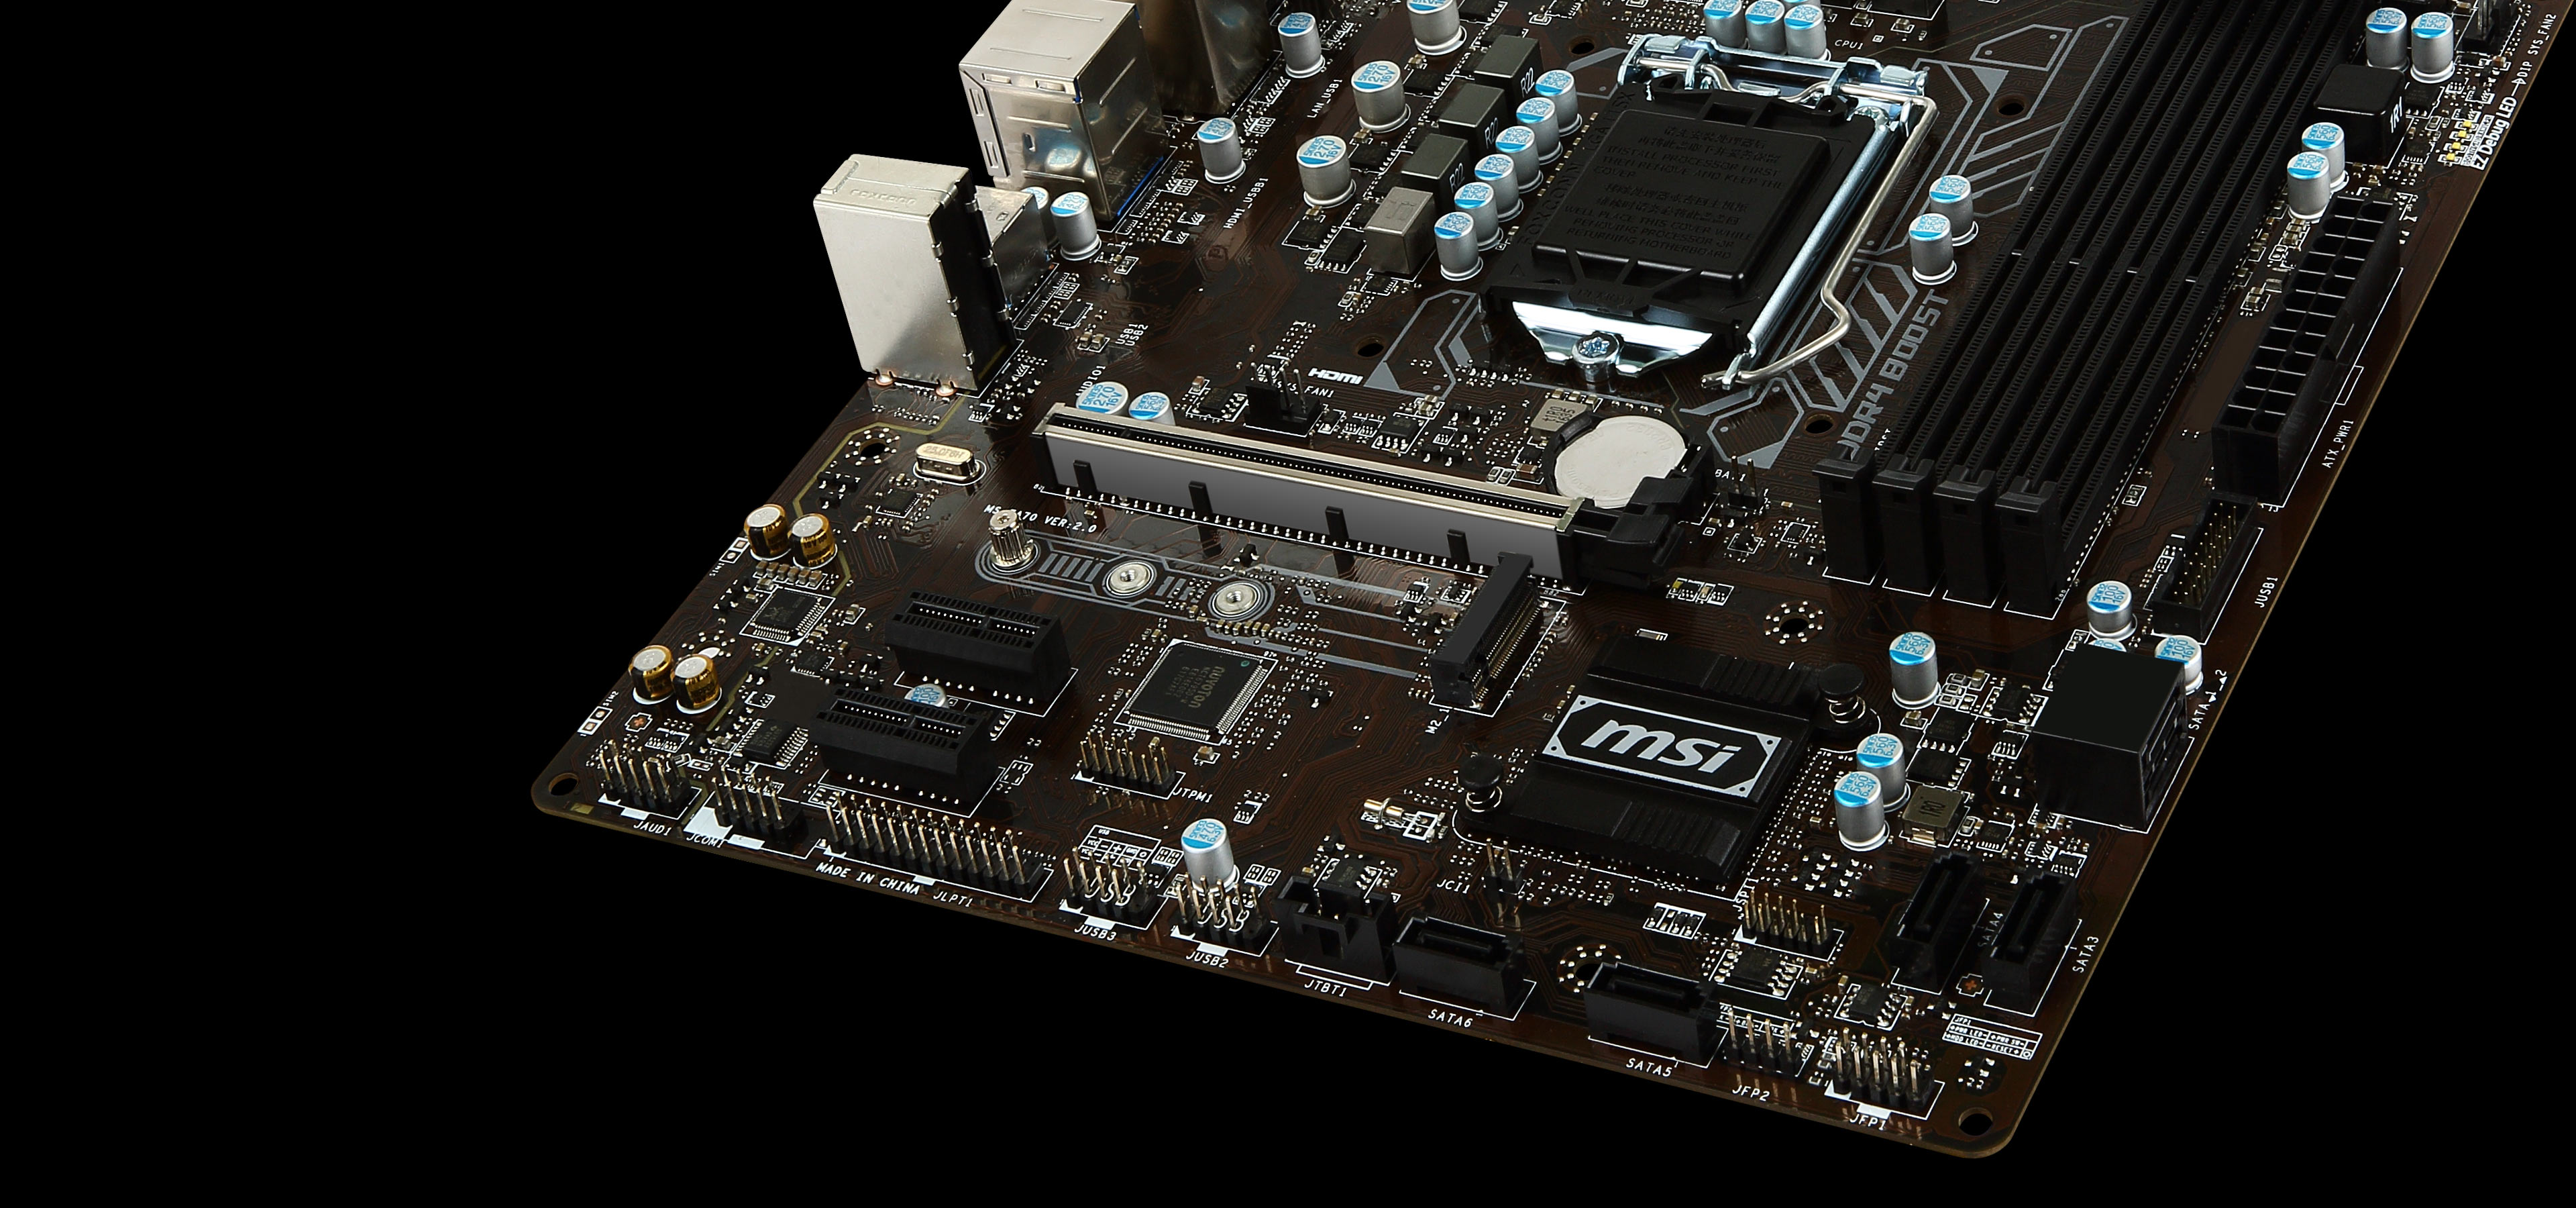 B250M PRO-VDH | Motherboard - The world leader in motherboard design